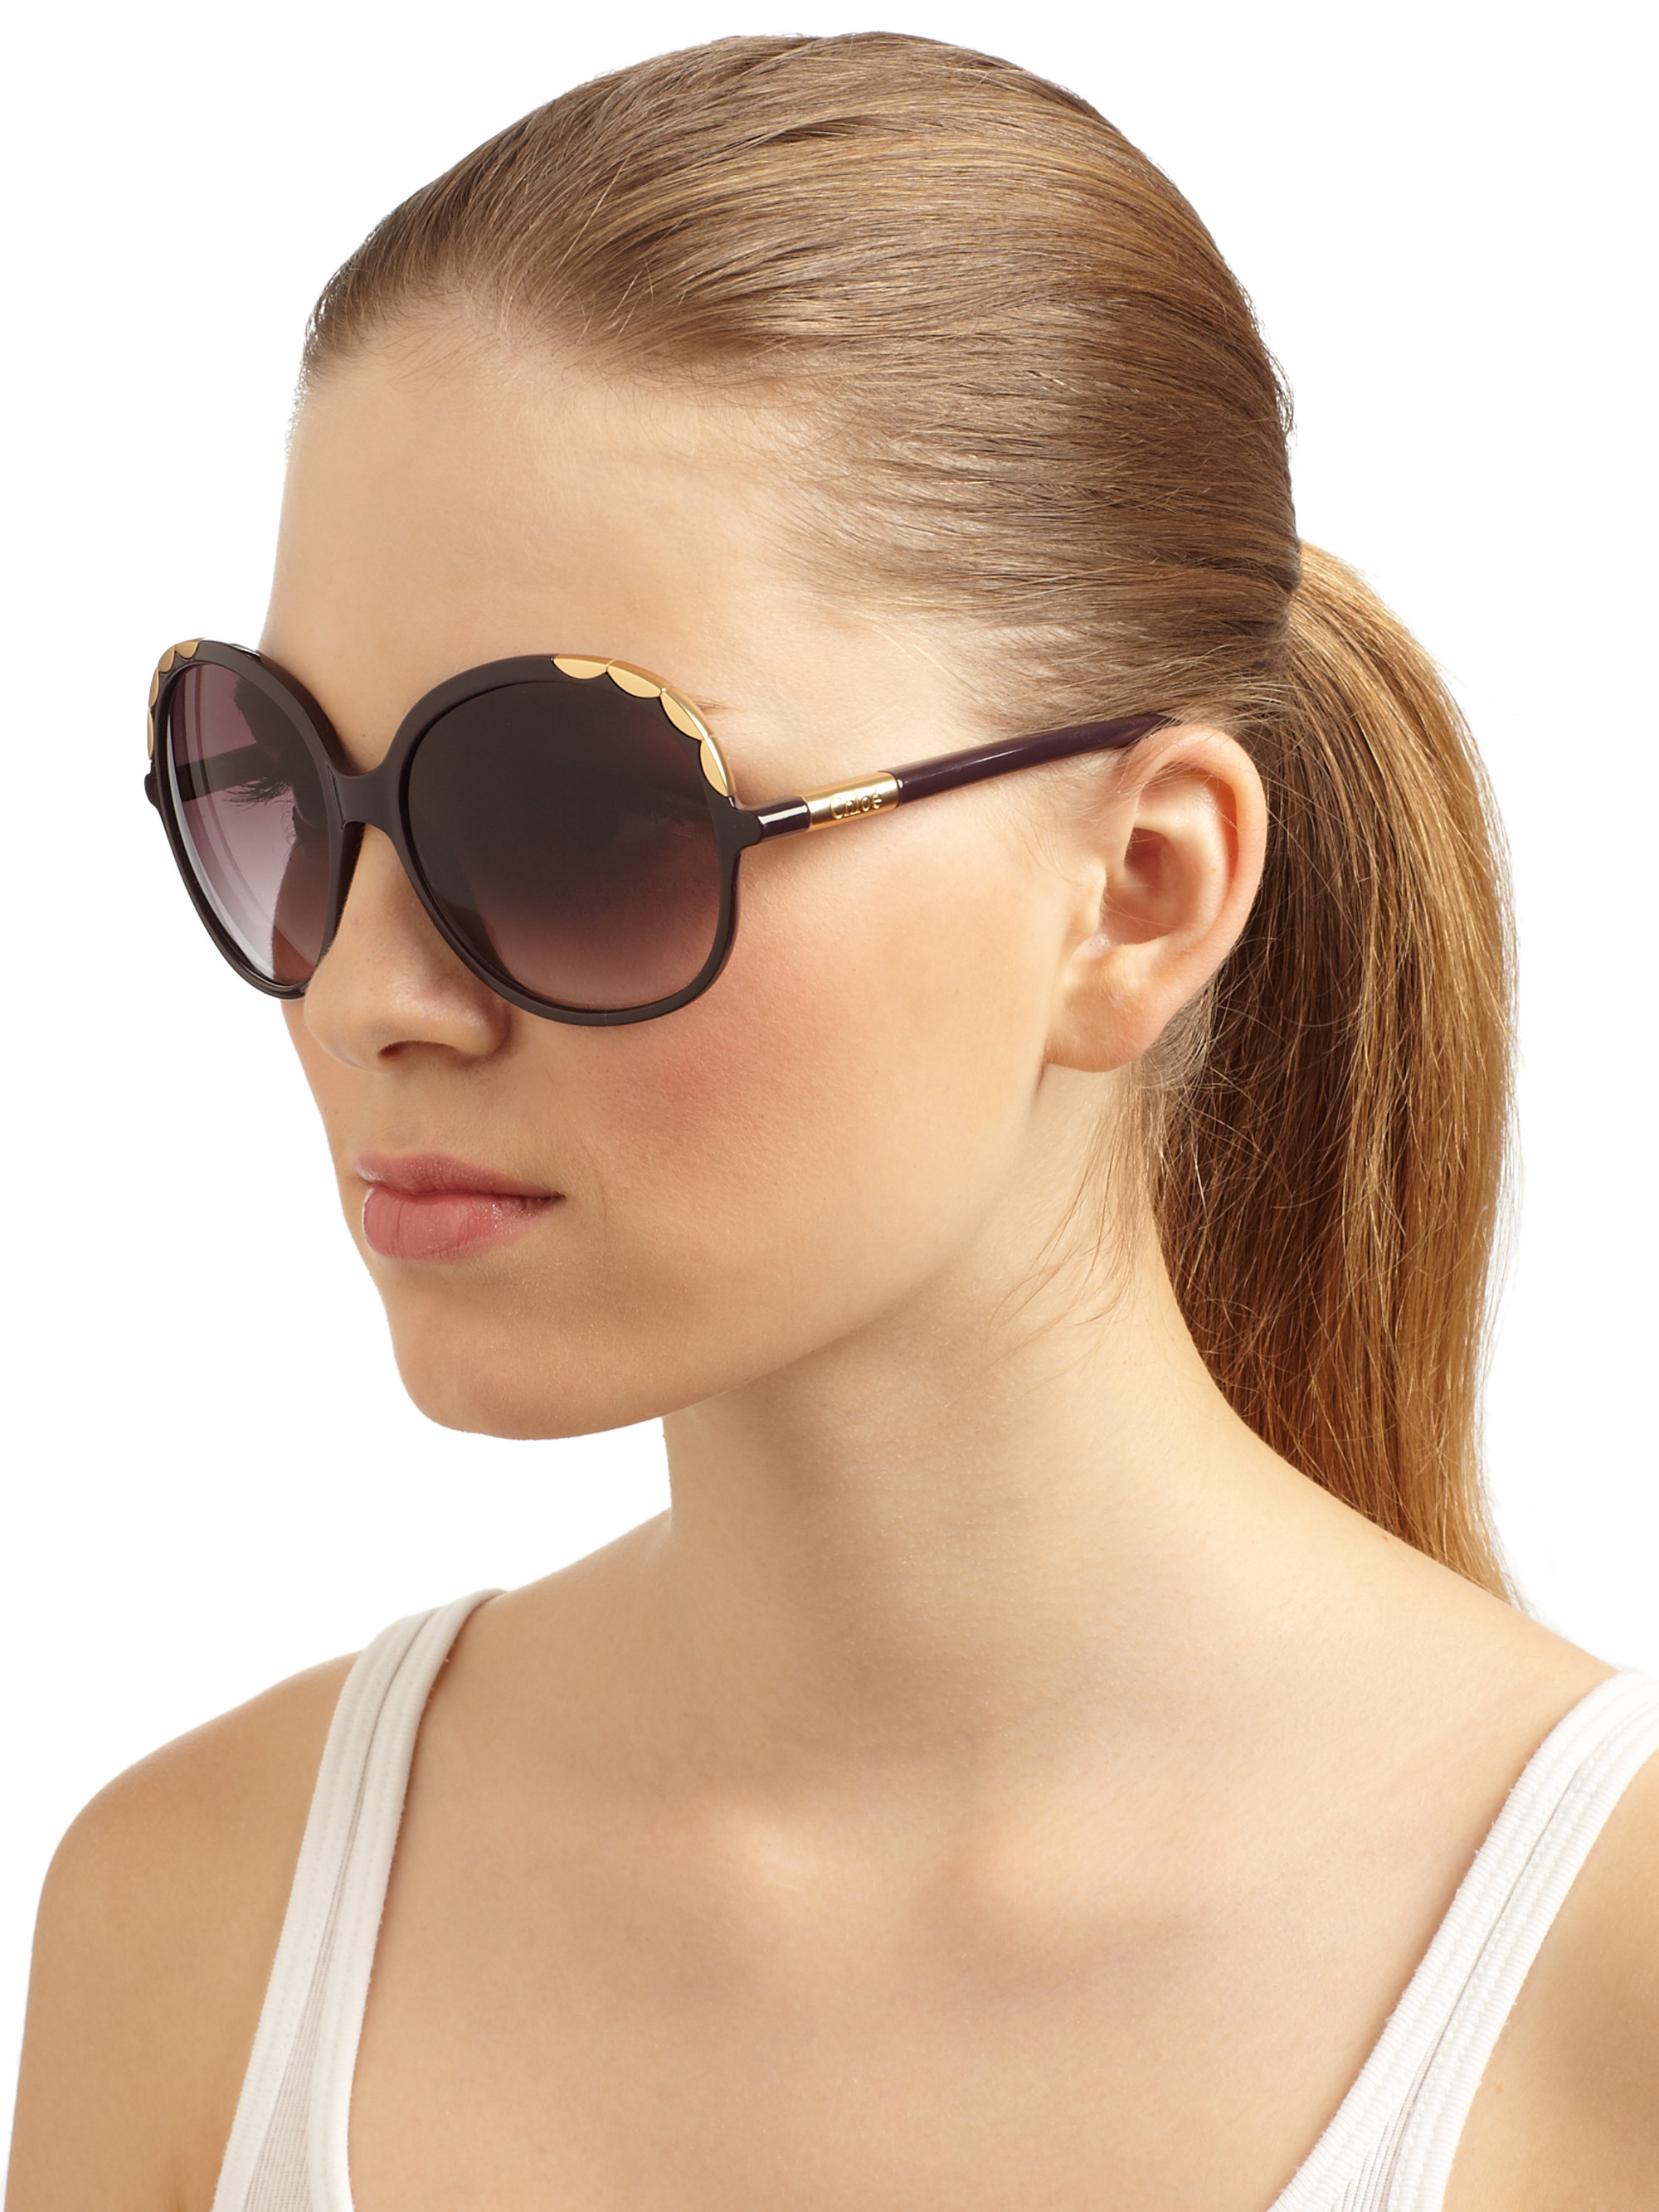 9f84a2b9f3 Chloé Oversized Scalloped Acetate Sunglasses in Black - Lyst